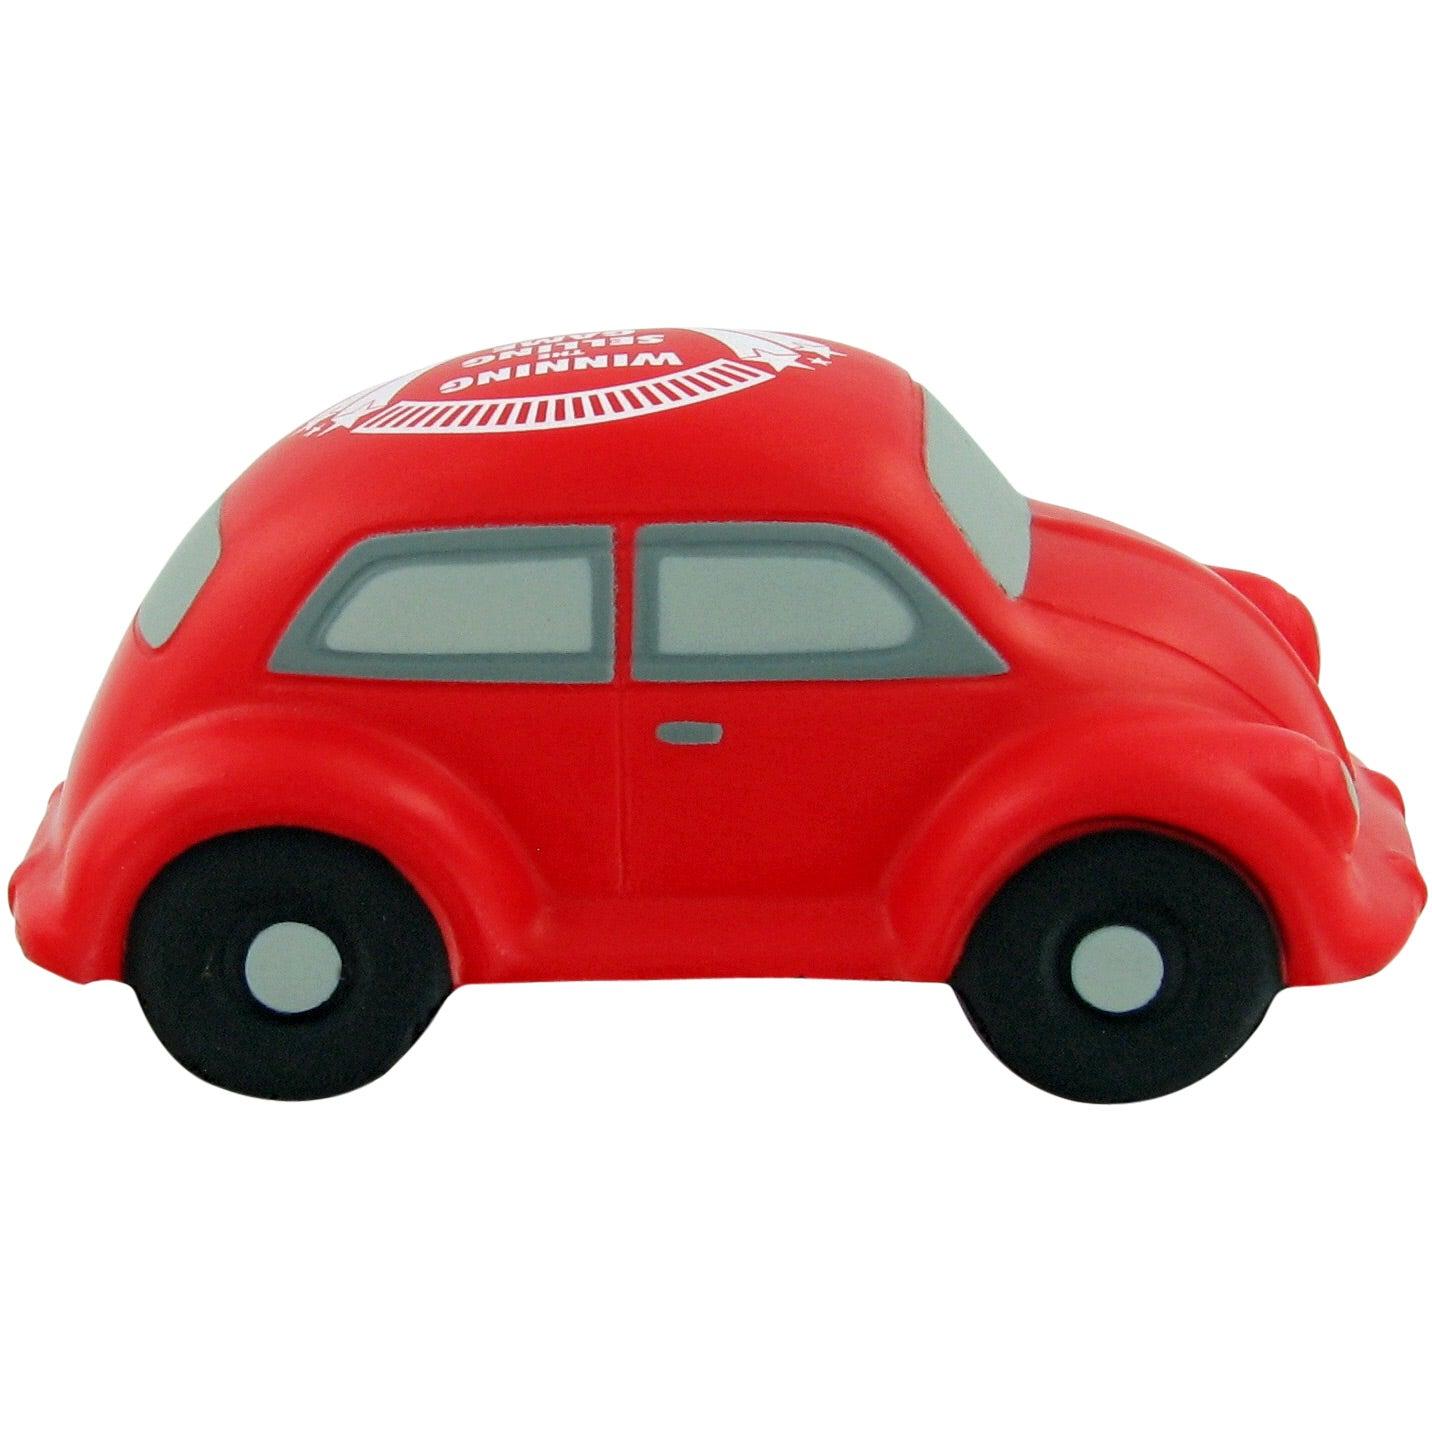 Small Toy Cars : Small car stress toy custom balls ea